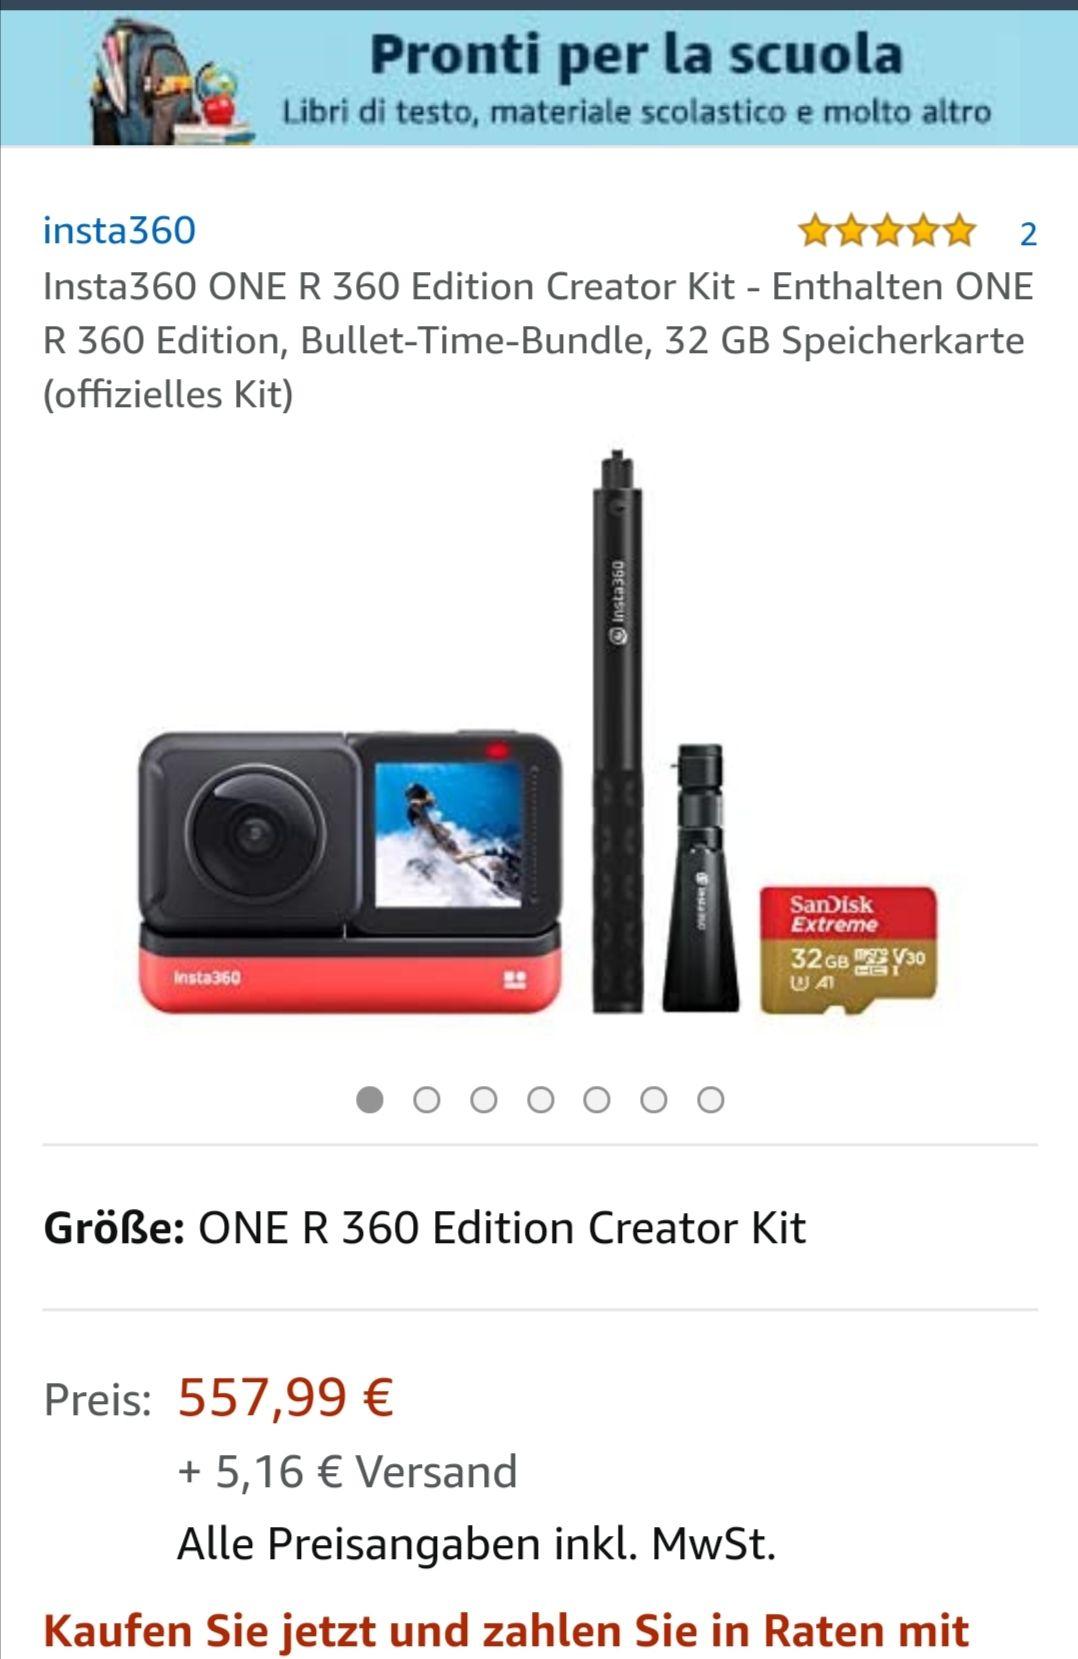 Insta360 ONE R Twin Edition Creator Kit - Einschließlich ONE R 360 Edition, Bullet-Time Bundle, 32 GB Speicherkarte (Offizielles Kit)